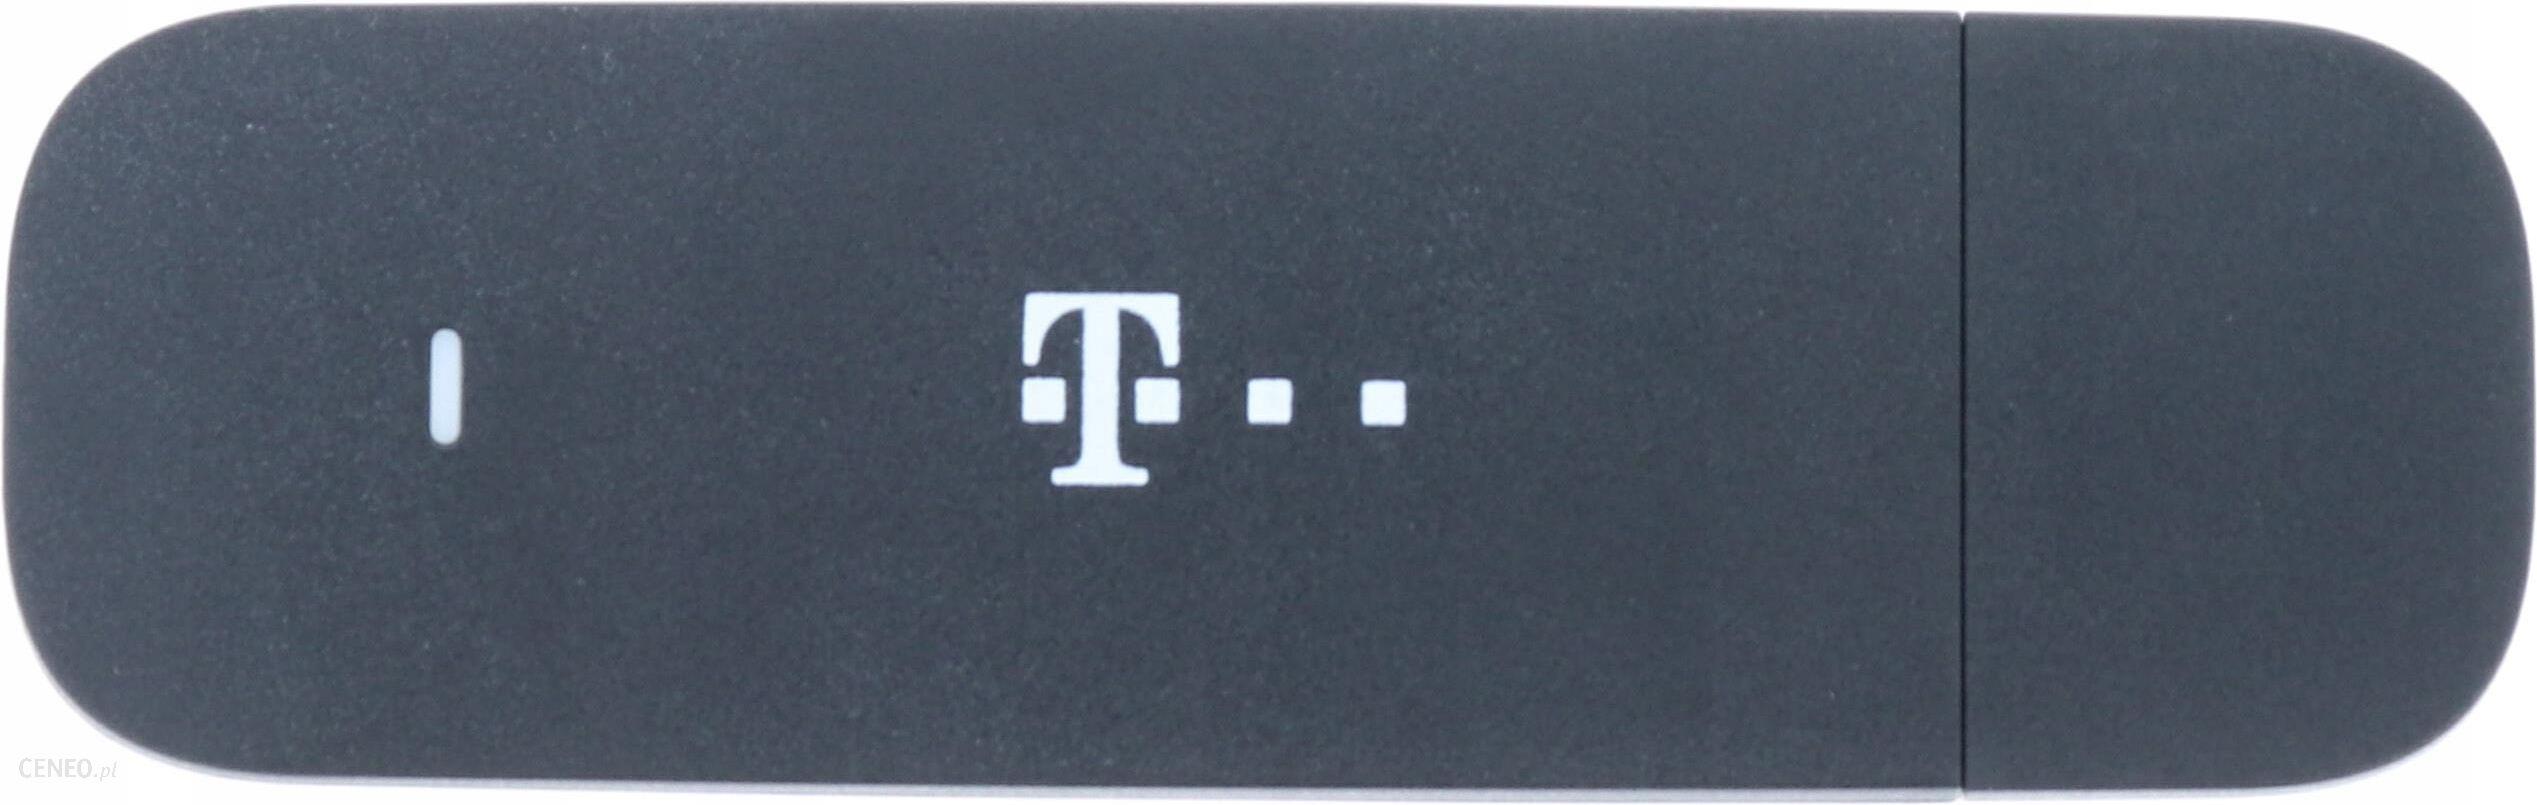 Modem Alcatel LINK KEY USB